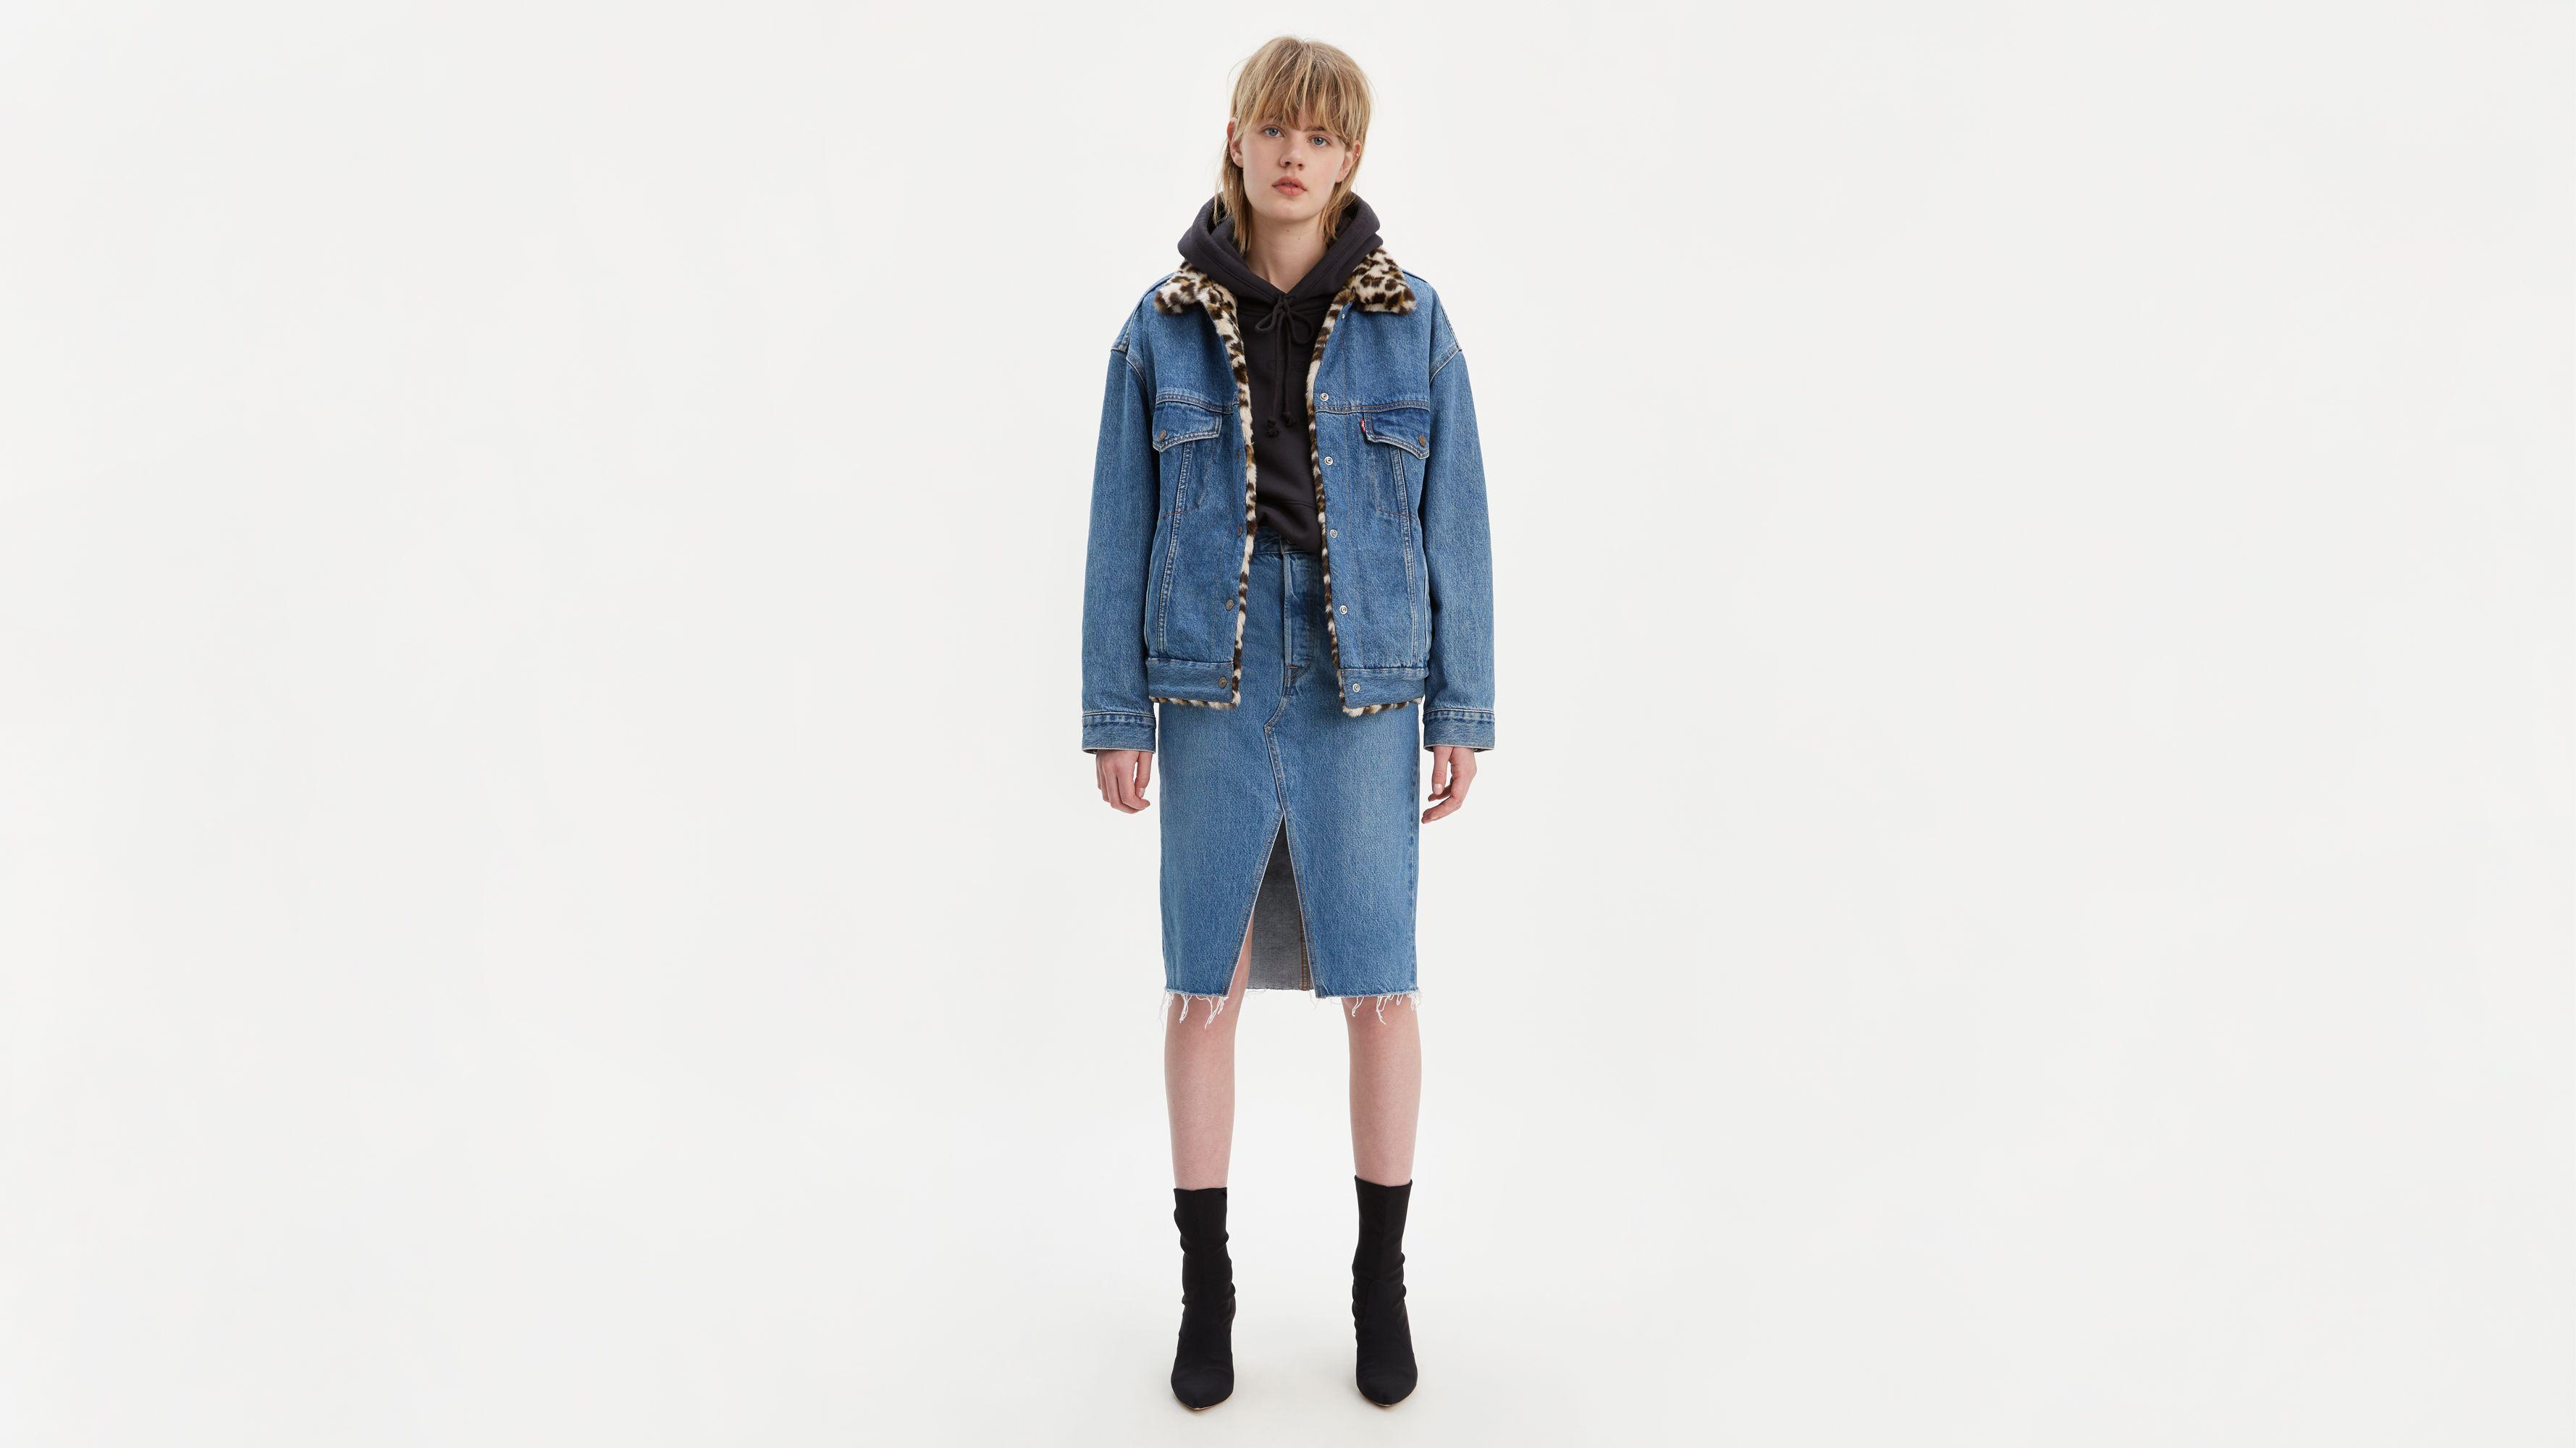 High Rise Deconstructed Midi Skirt